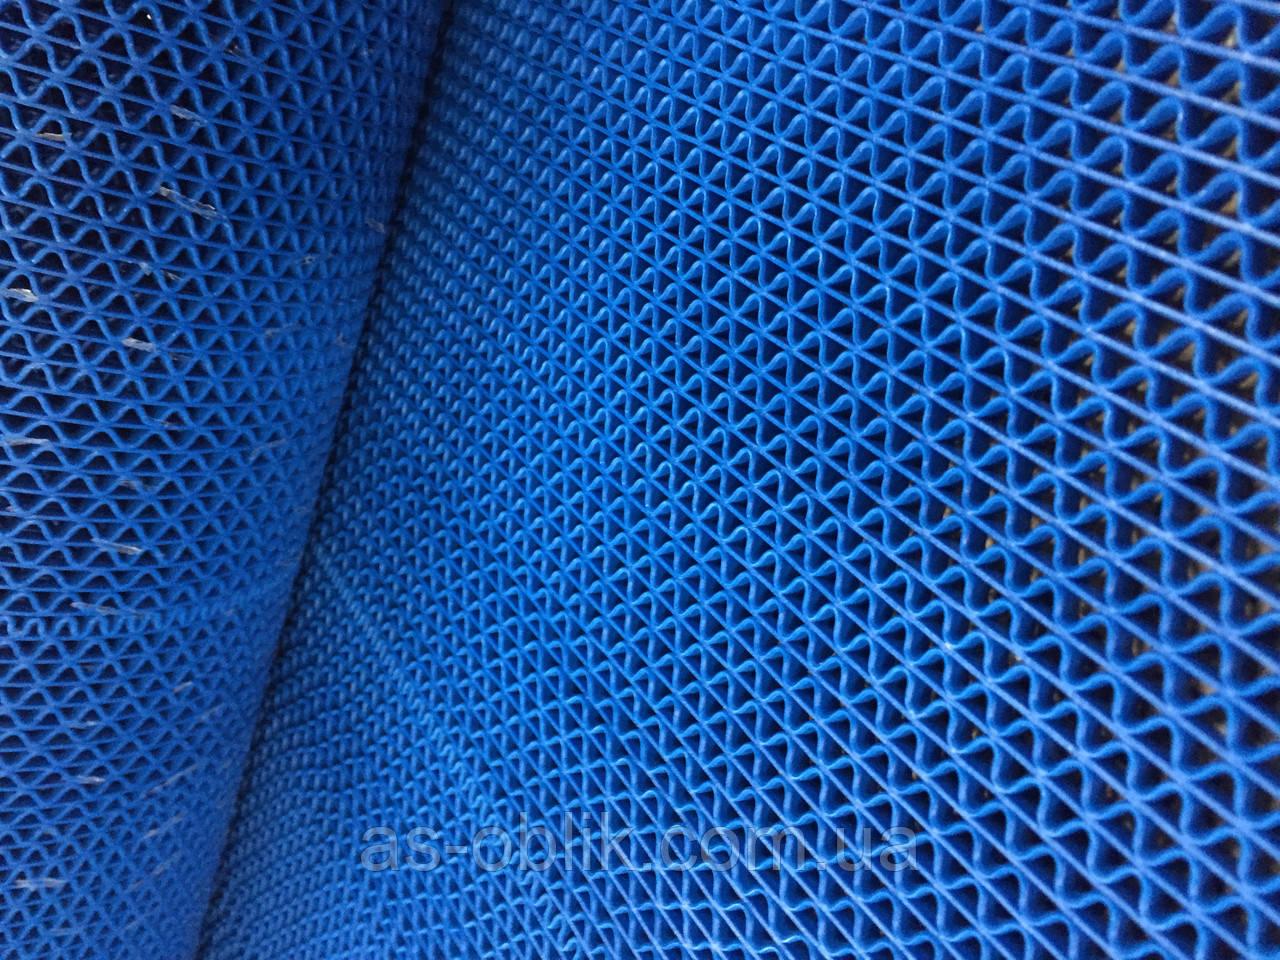 Ковер резиновый 4000х500 мм Крокус нью синий